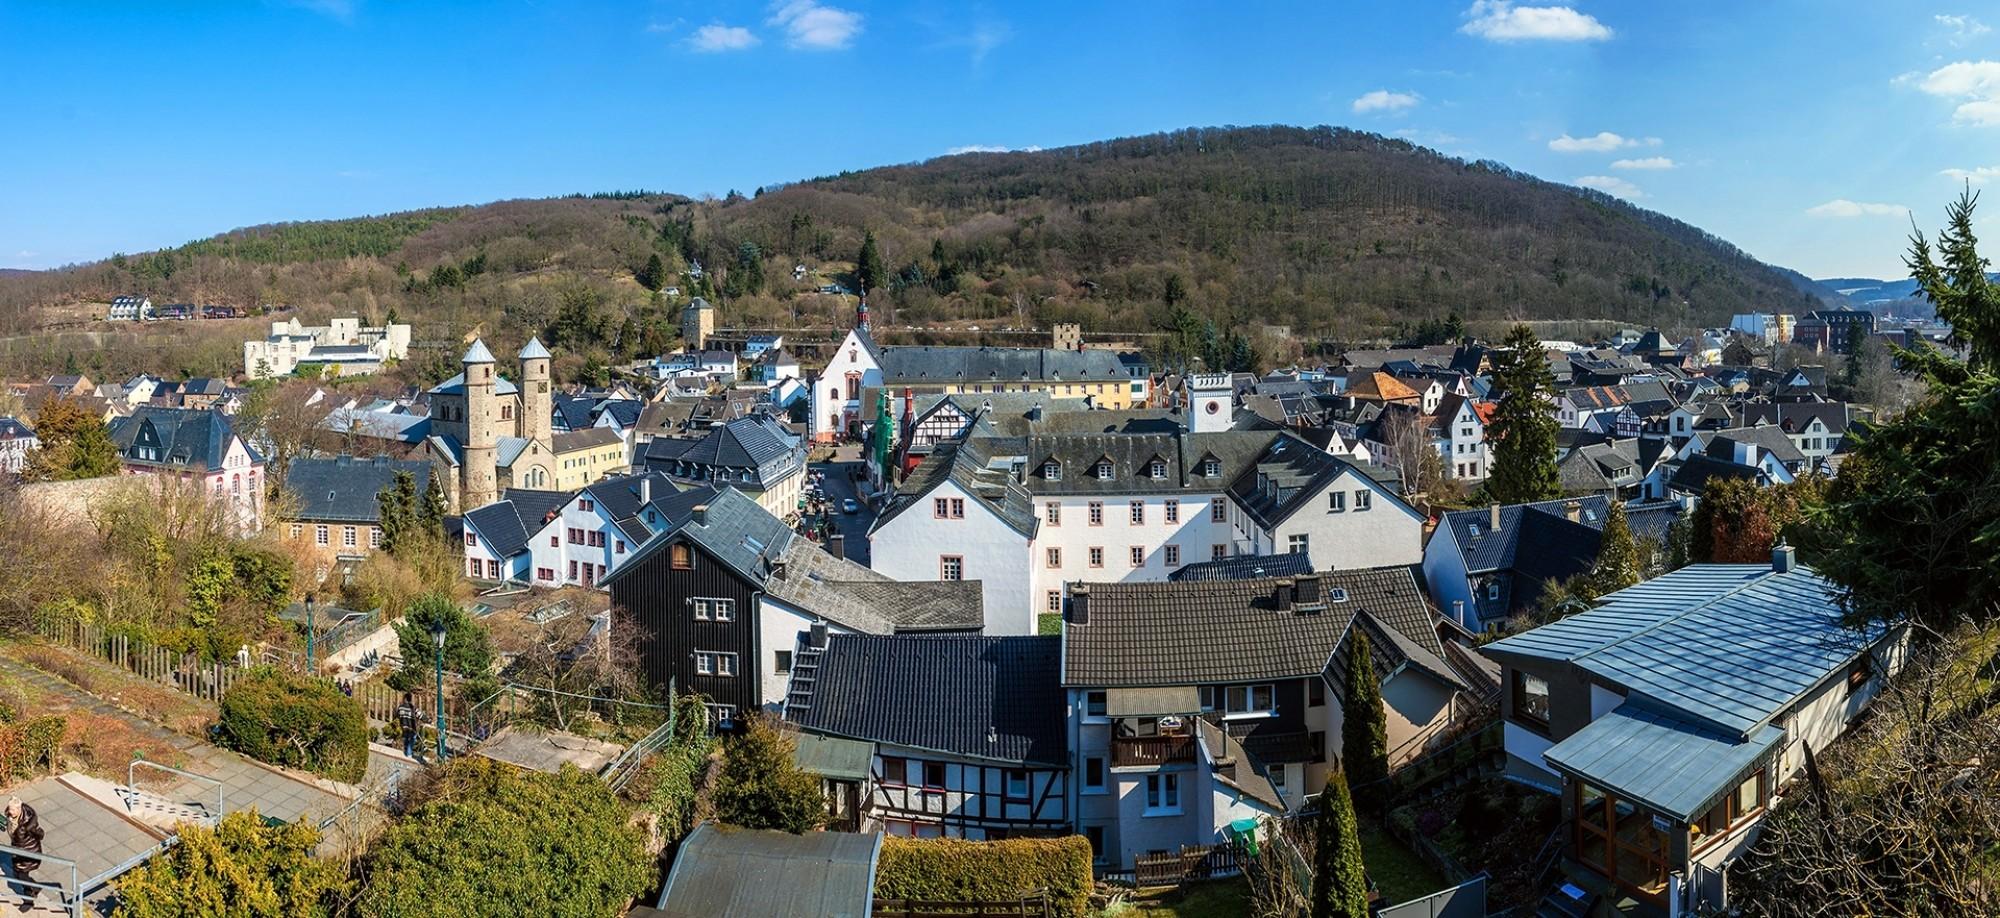 View-of-Bad-Muenstereifel-Germany